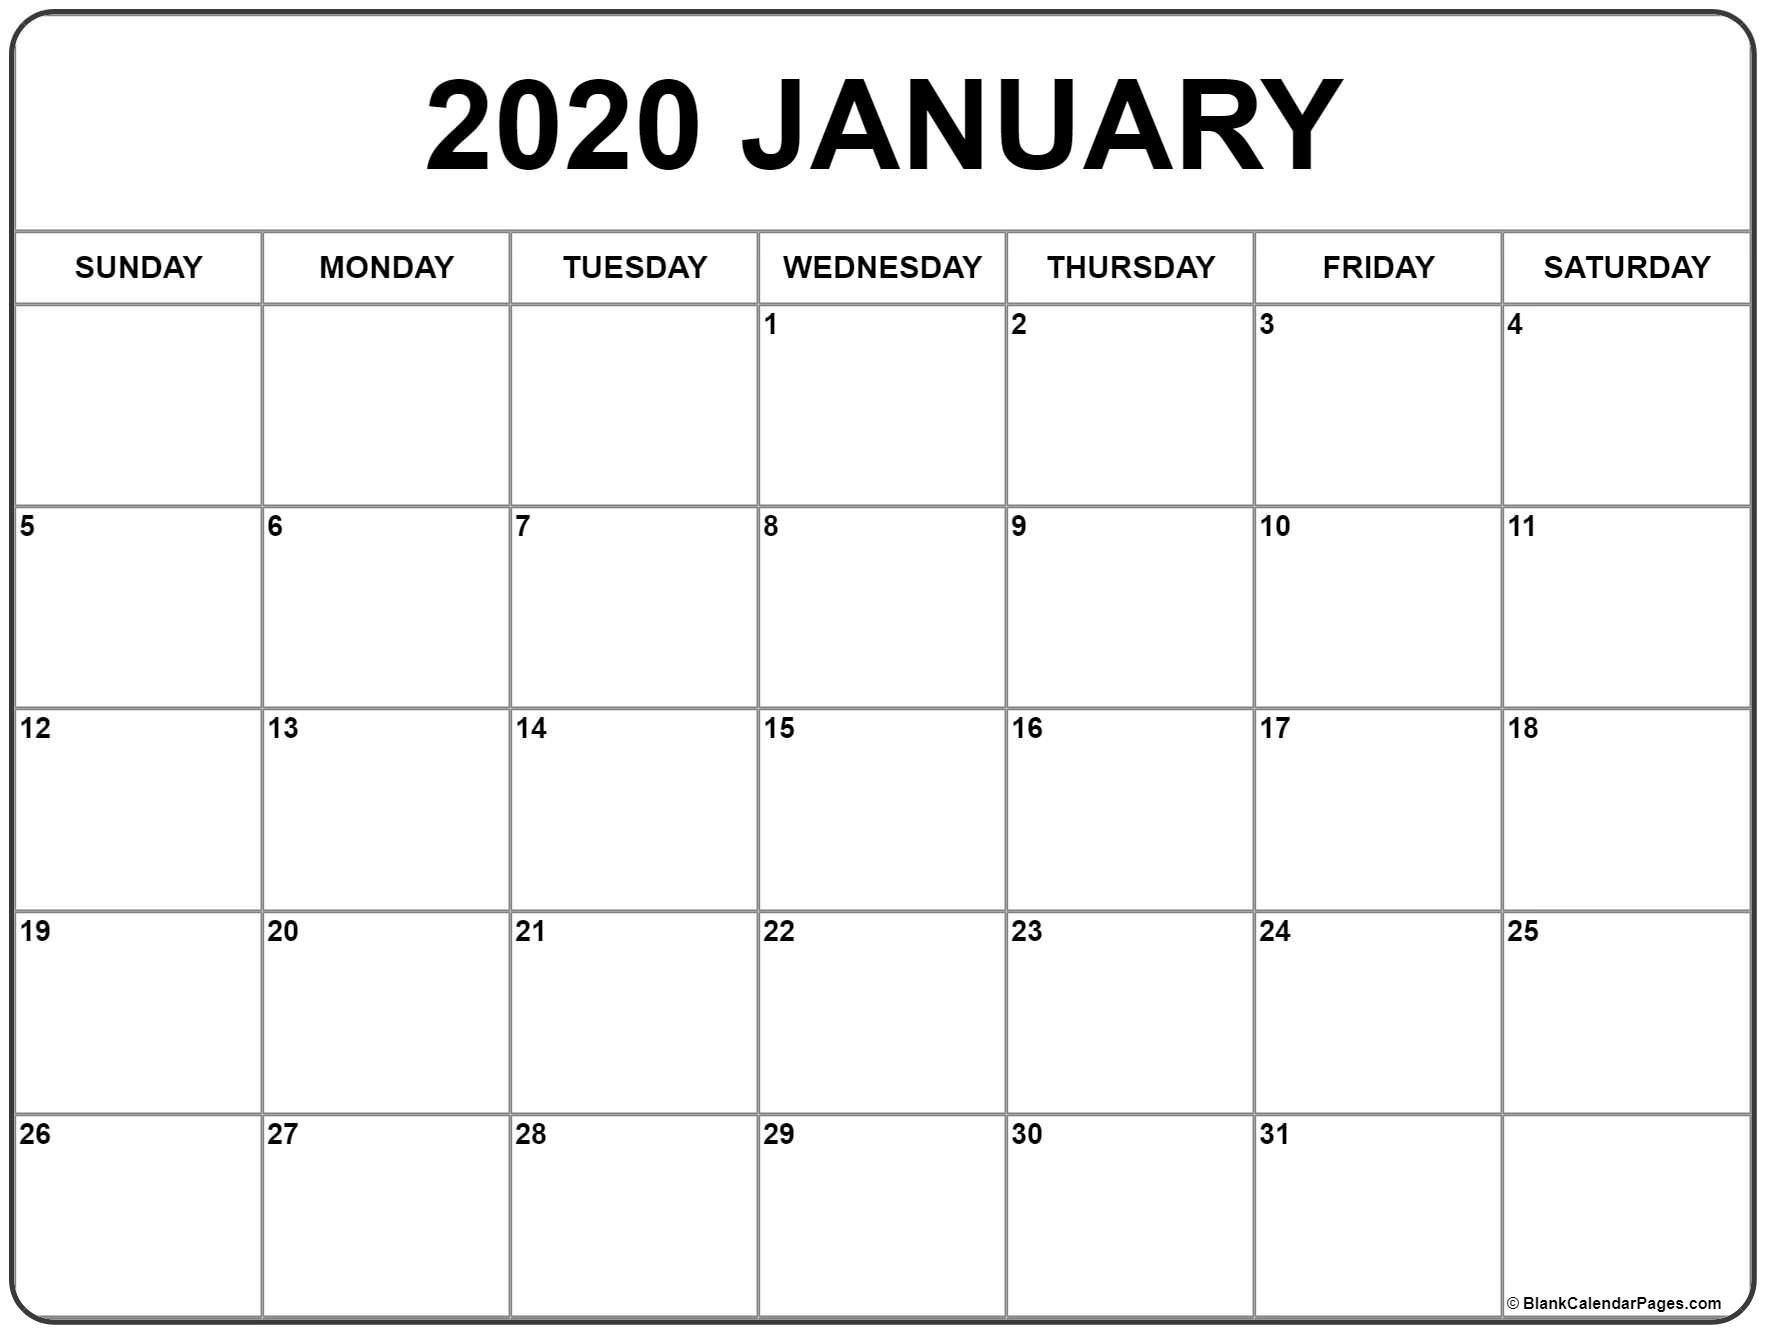 January 2020 Calendar | Free Printable Monthly Calendars-January Calendar For 2020